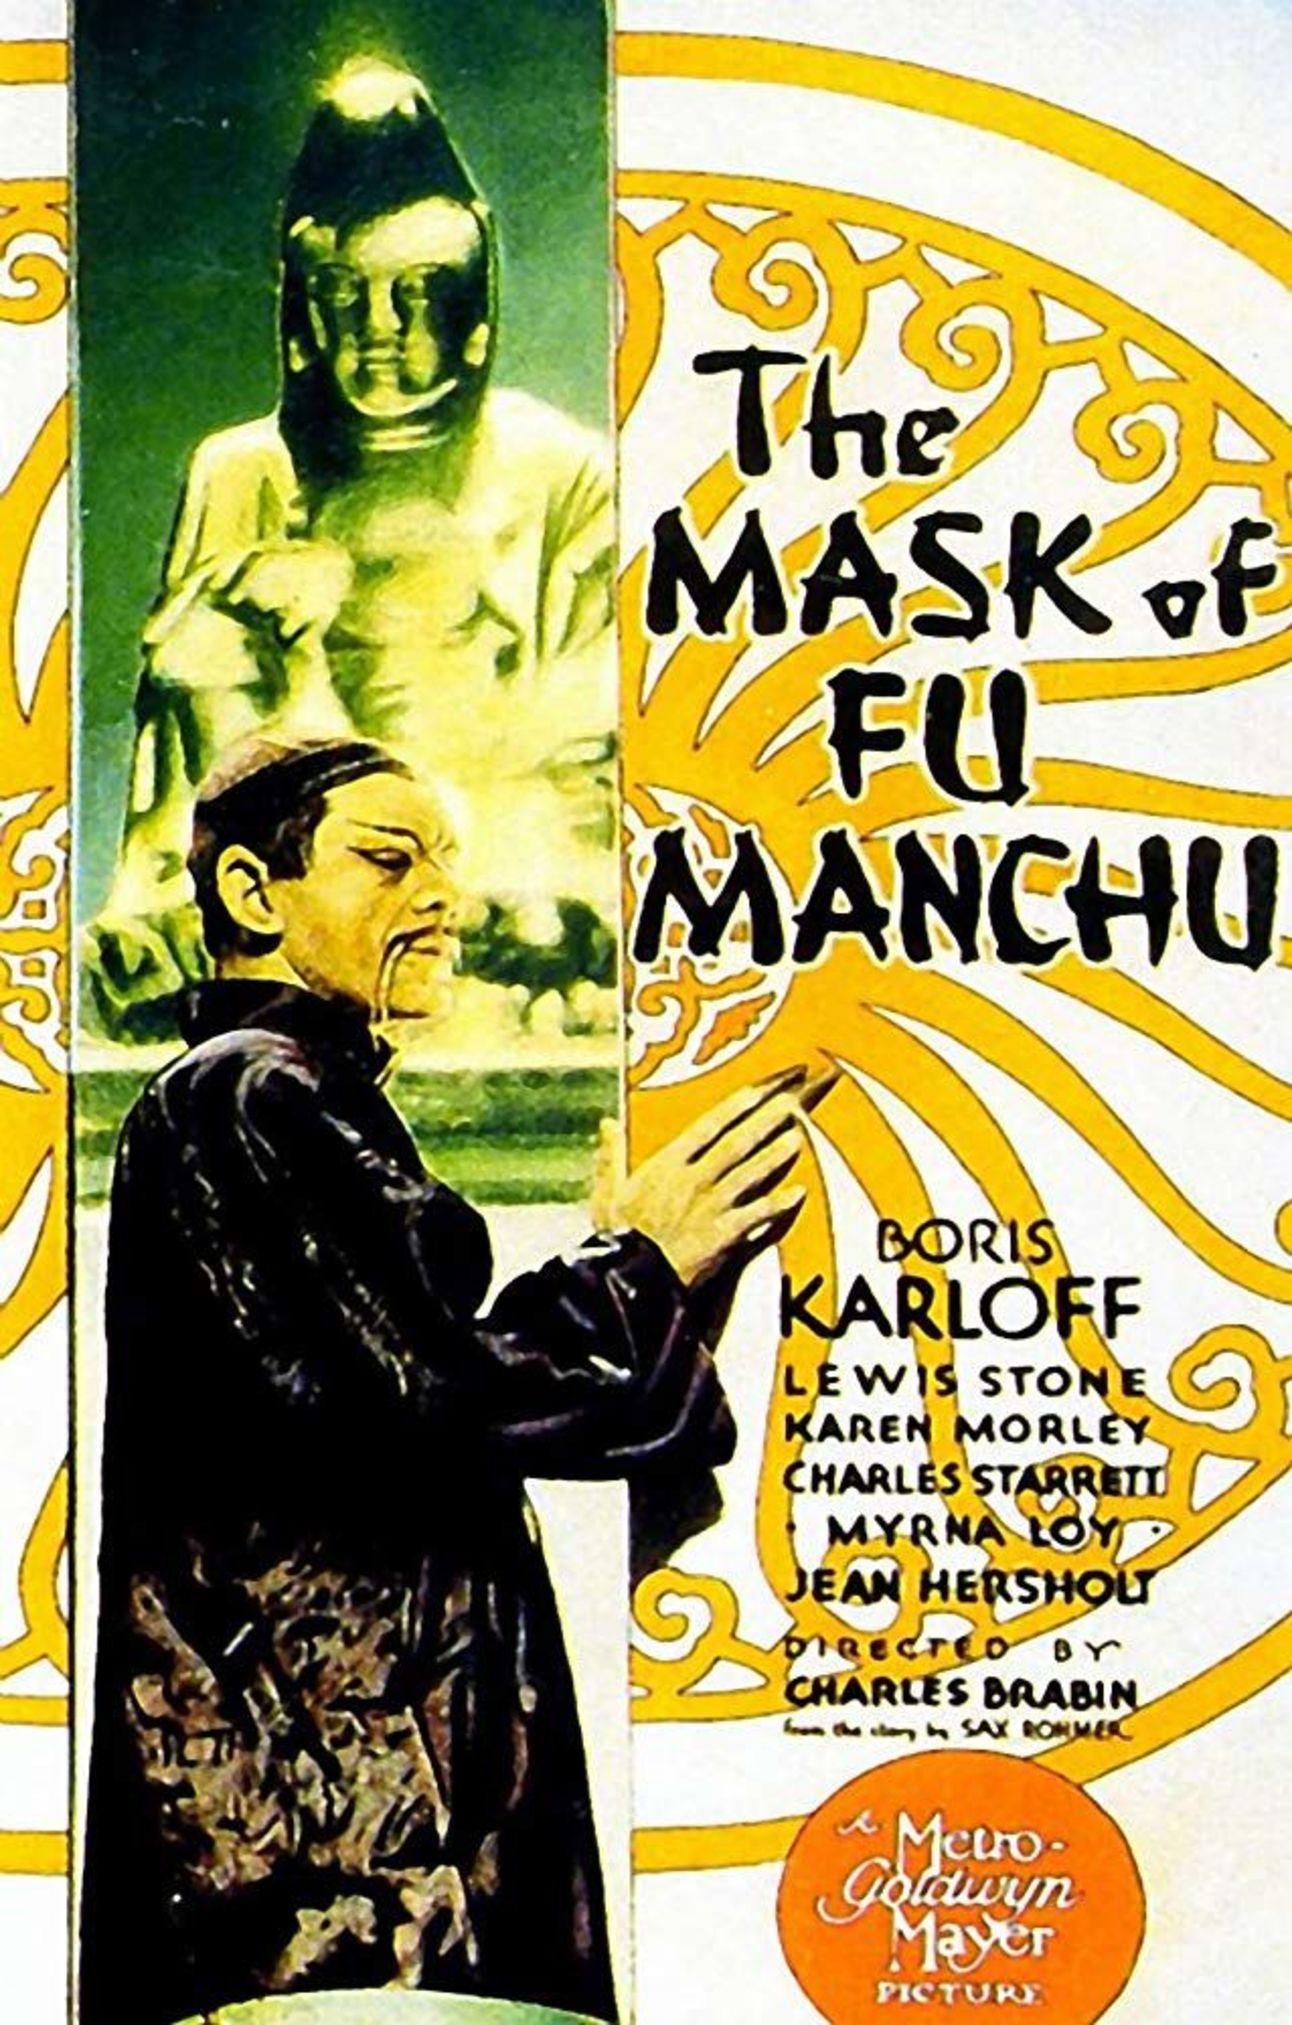 The Mask of Fu Manchu (1932) poster